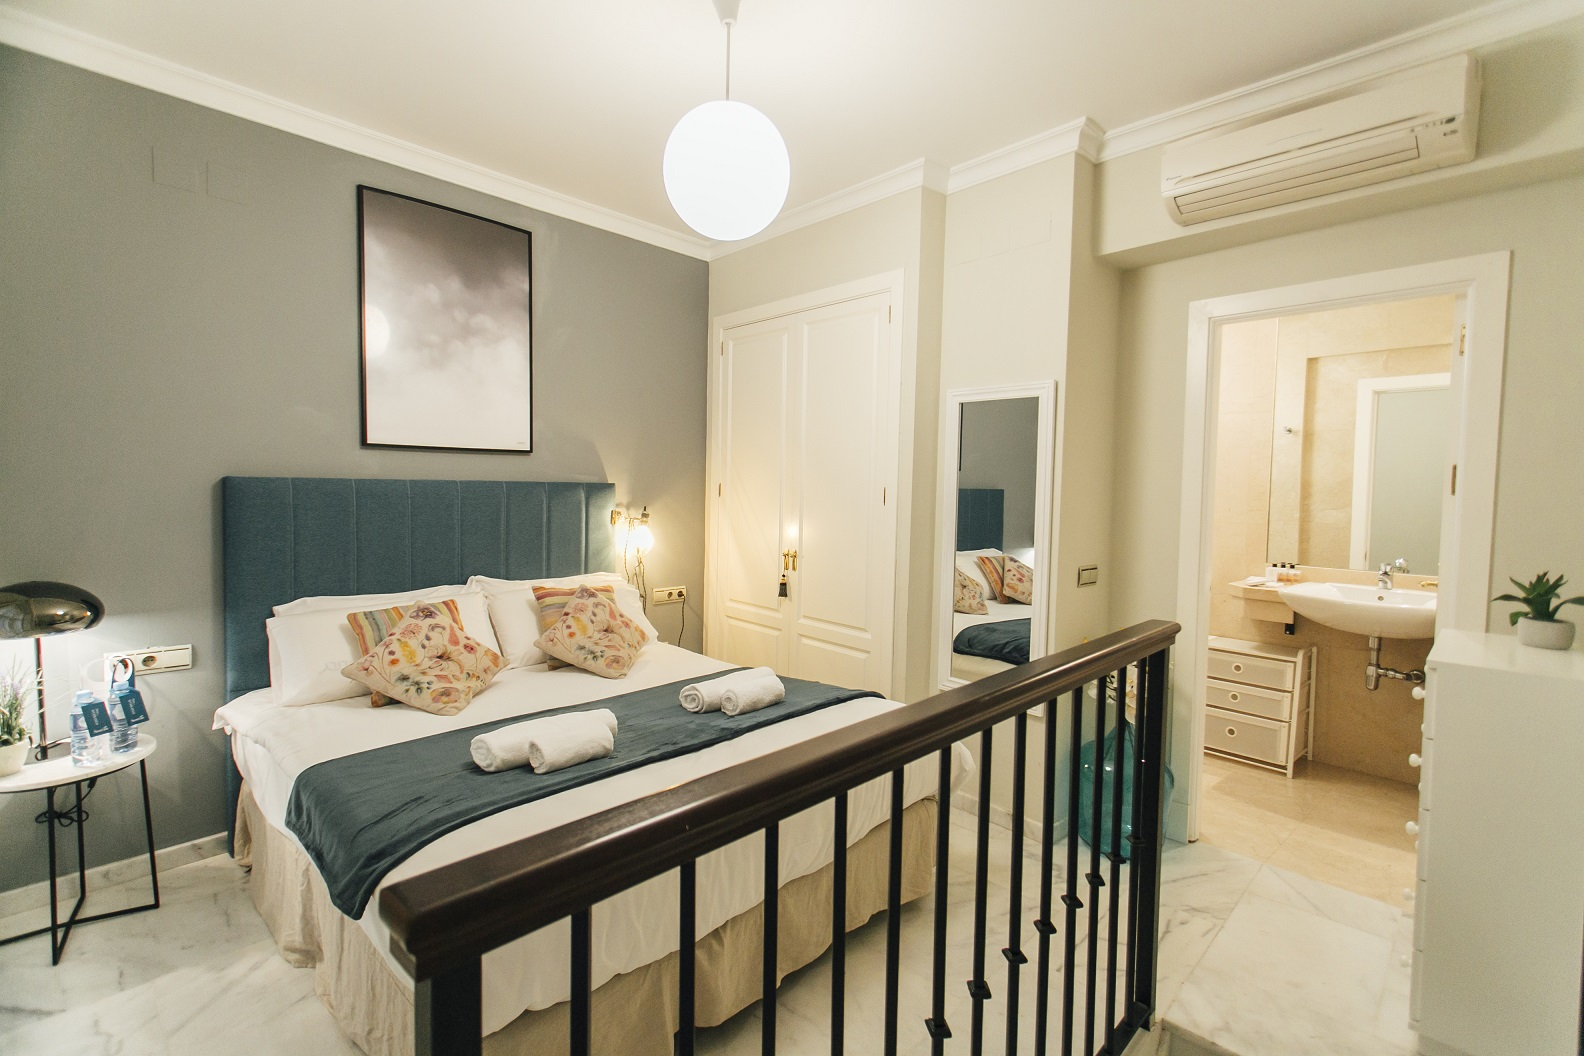 Bed at Dean Miranda Apartment